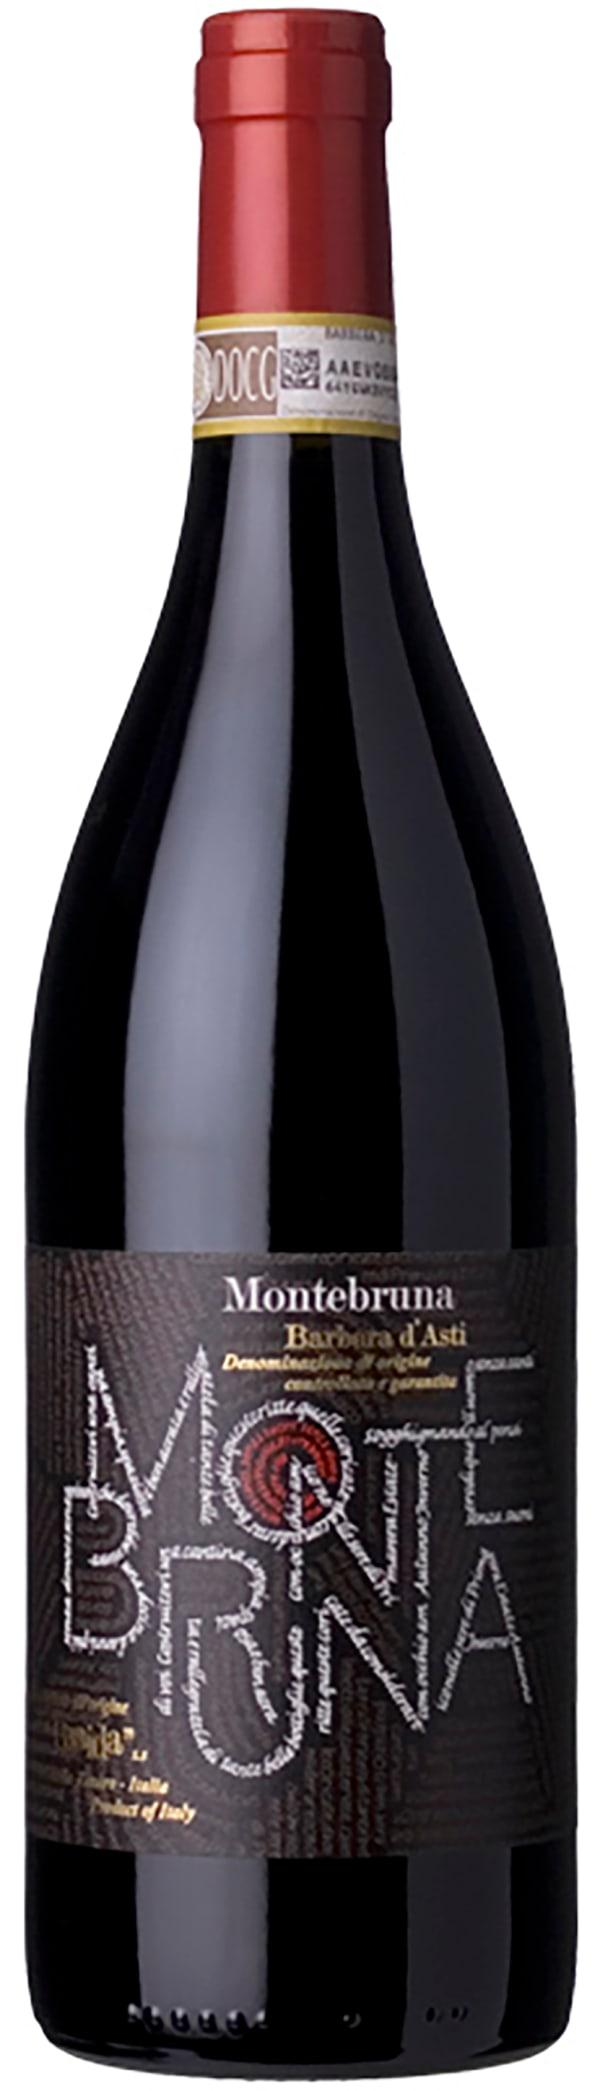 Montebruna Barbera d'Asti 2015